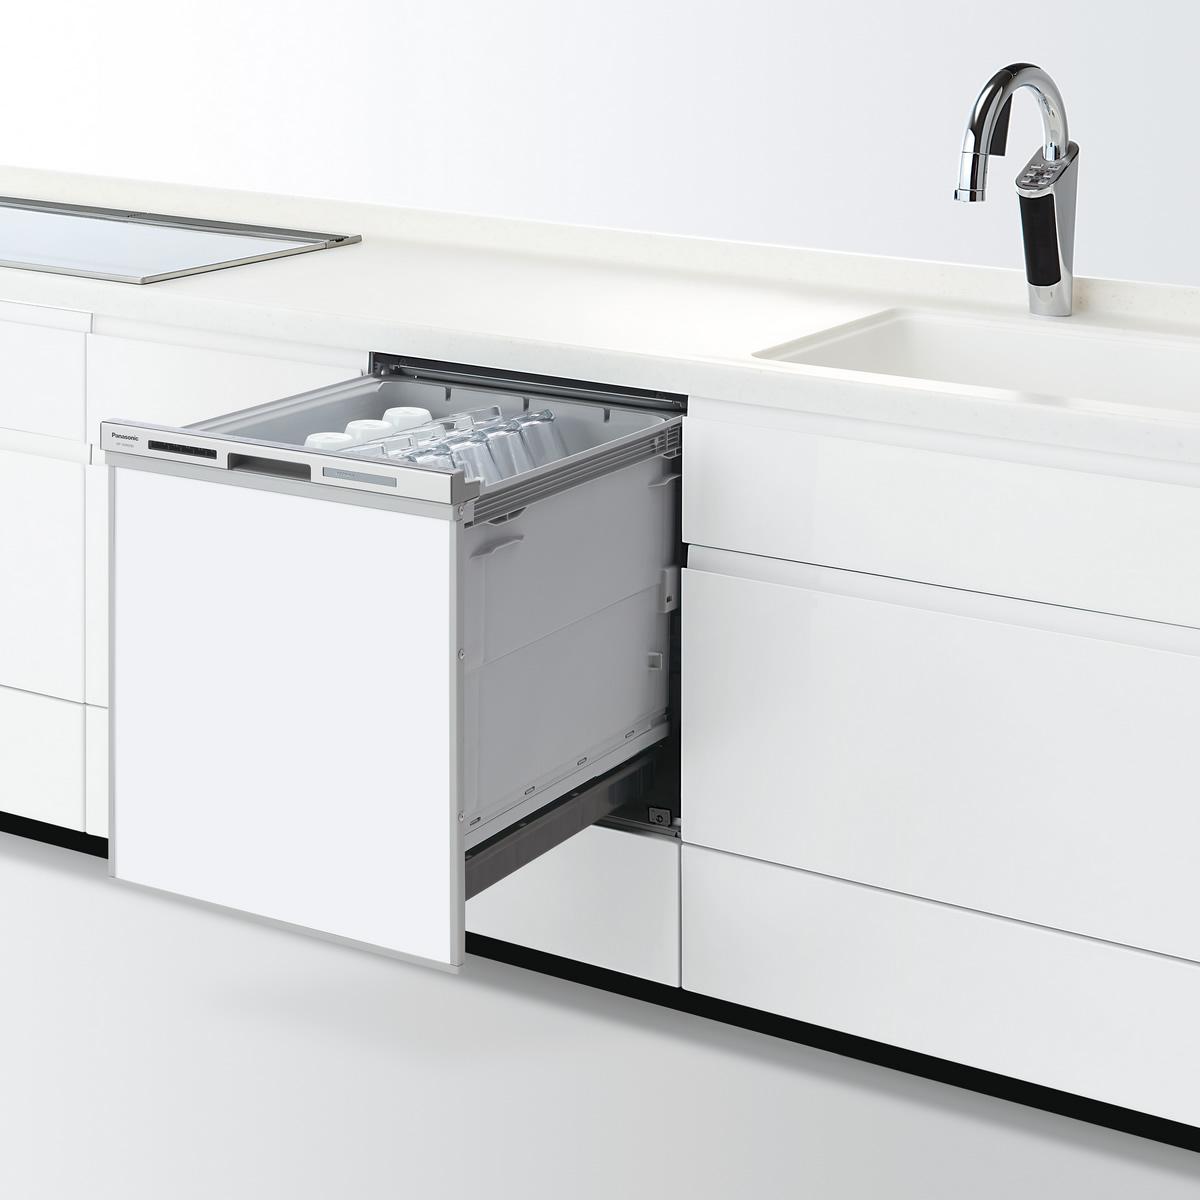 【NP-45MD8S】 パナソニック ビルトイン食器洗い乾燥機(食洗機) M8シリーズ 幅45cm ディープタイプ ドアパネル型